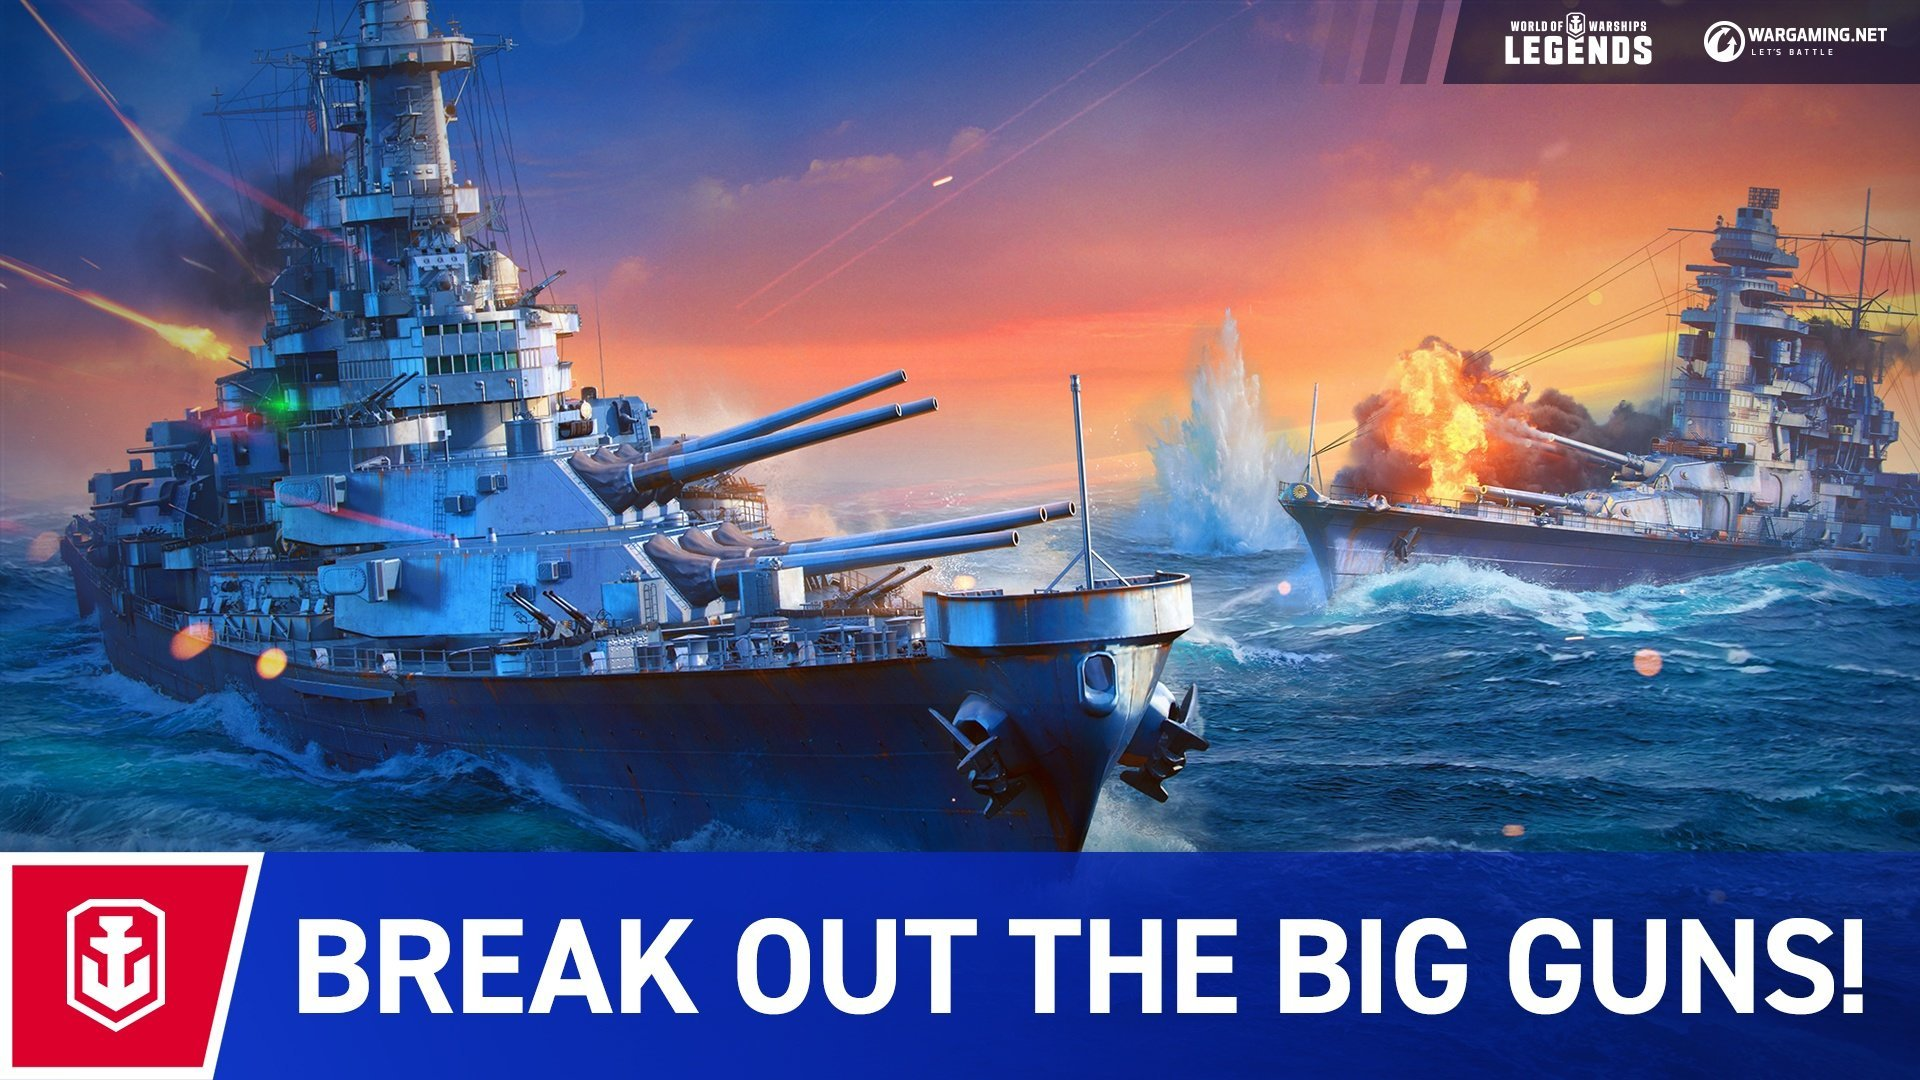 WoWS: Legends - Become a naval legend - WoWS: Legends